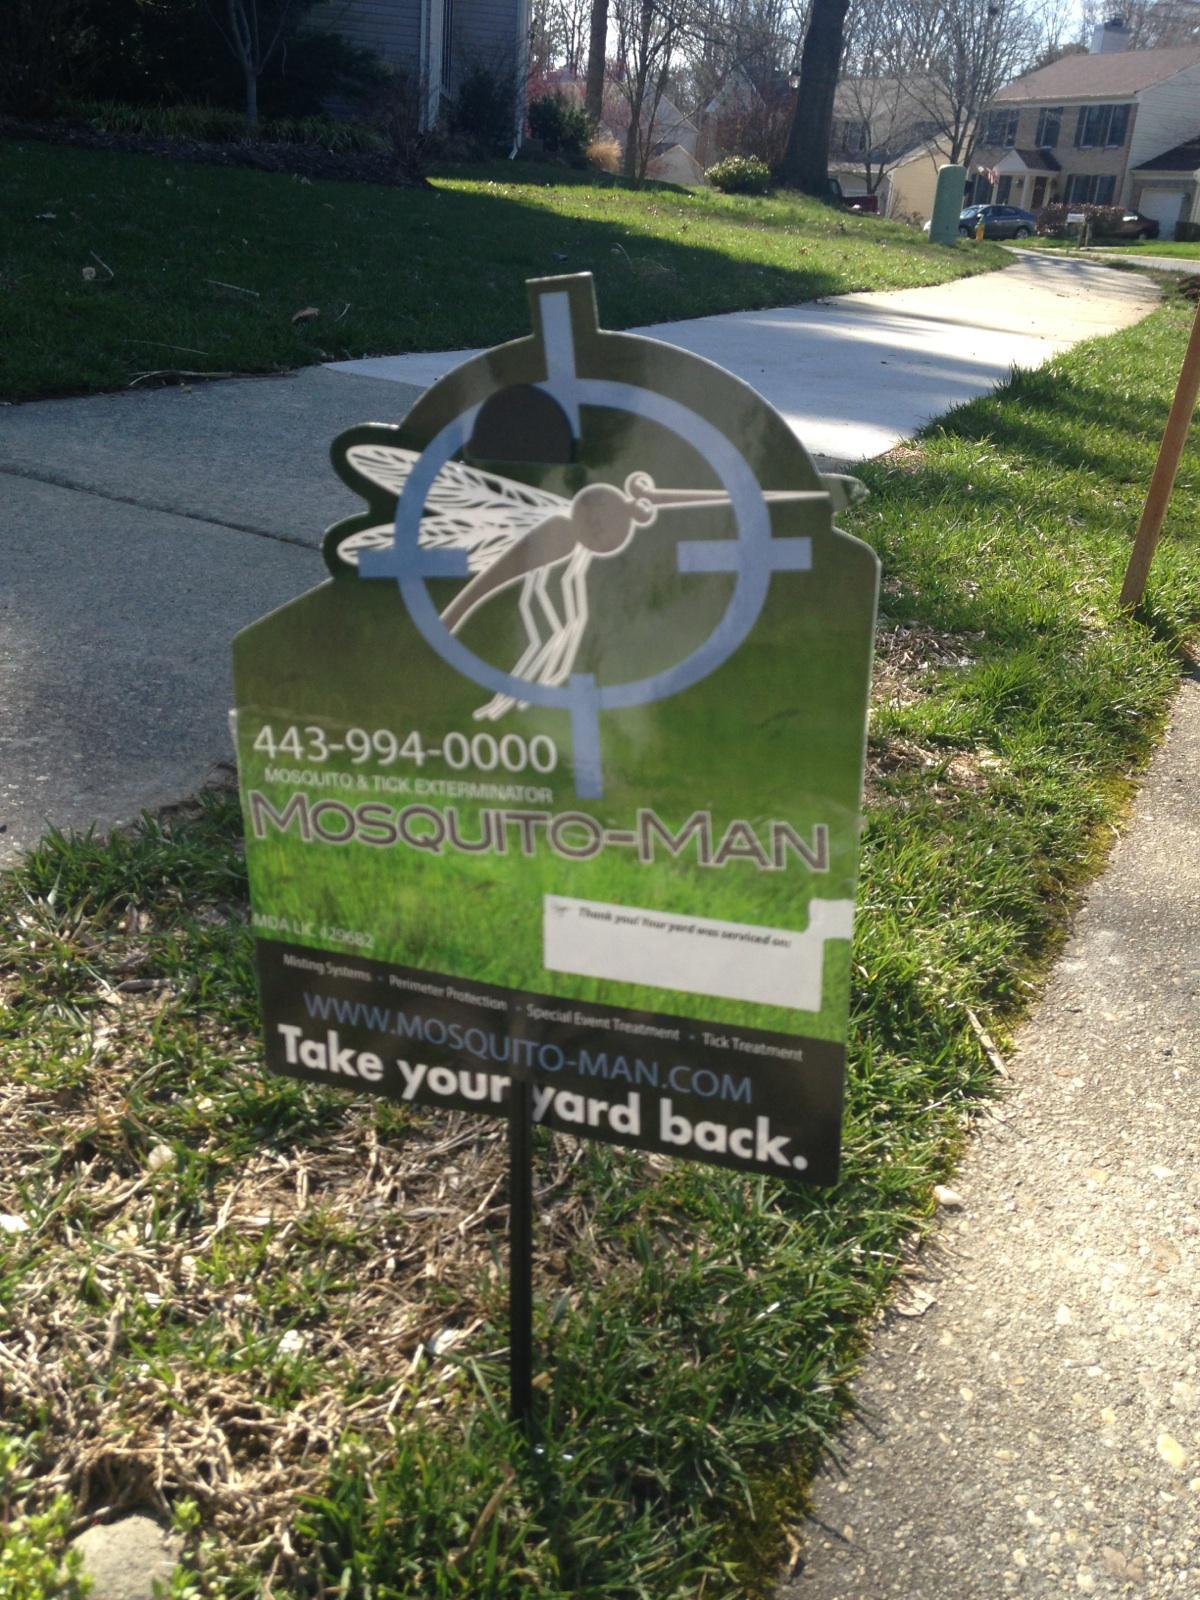 Mosquito-Man, LLC image 4